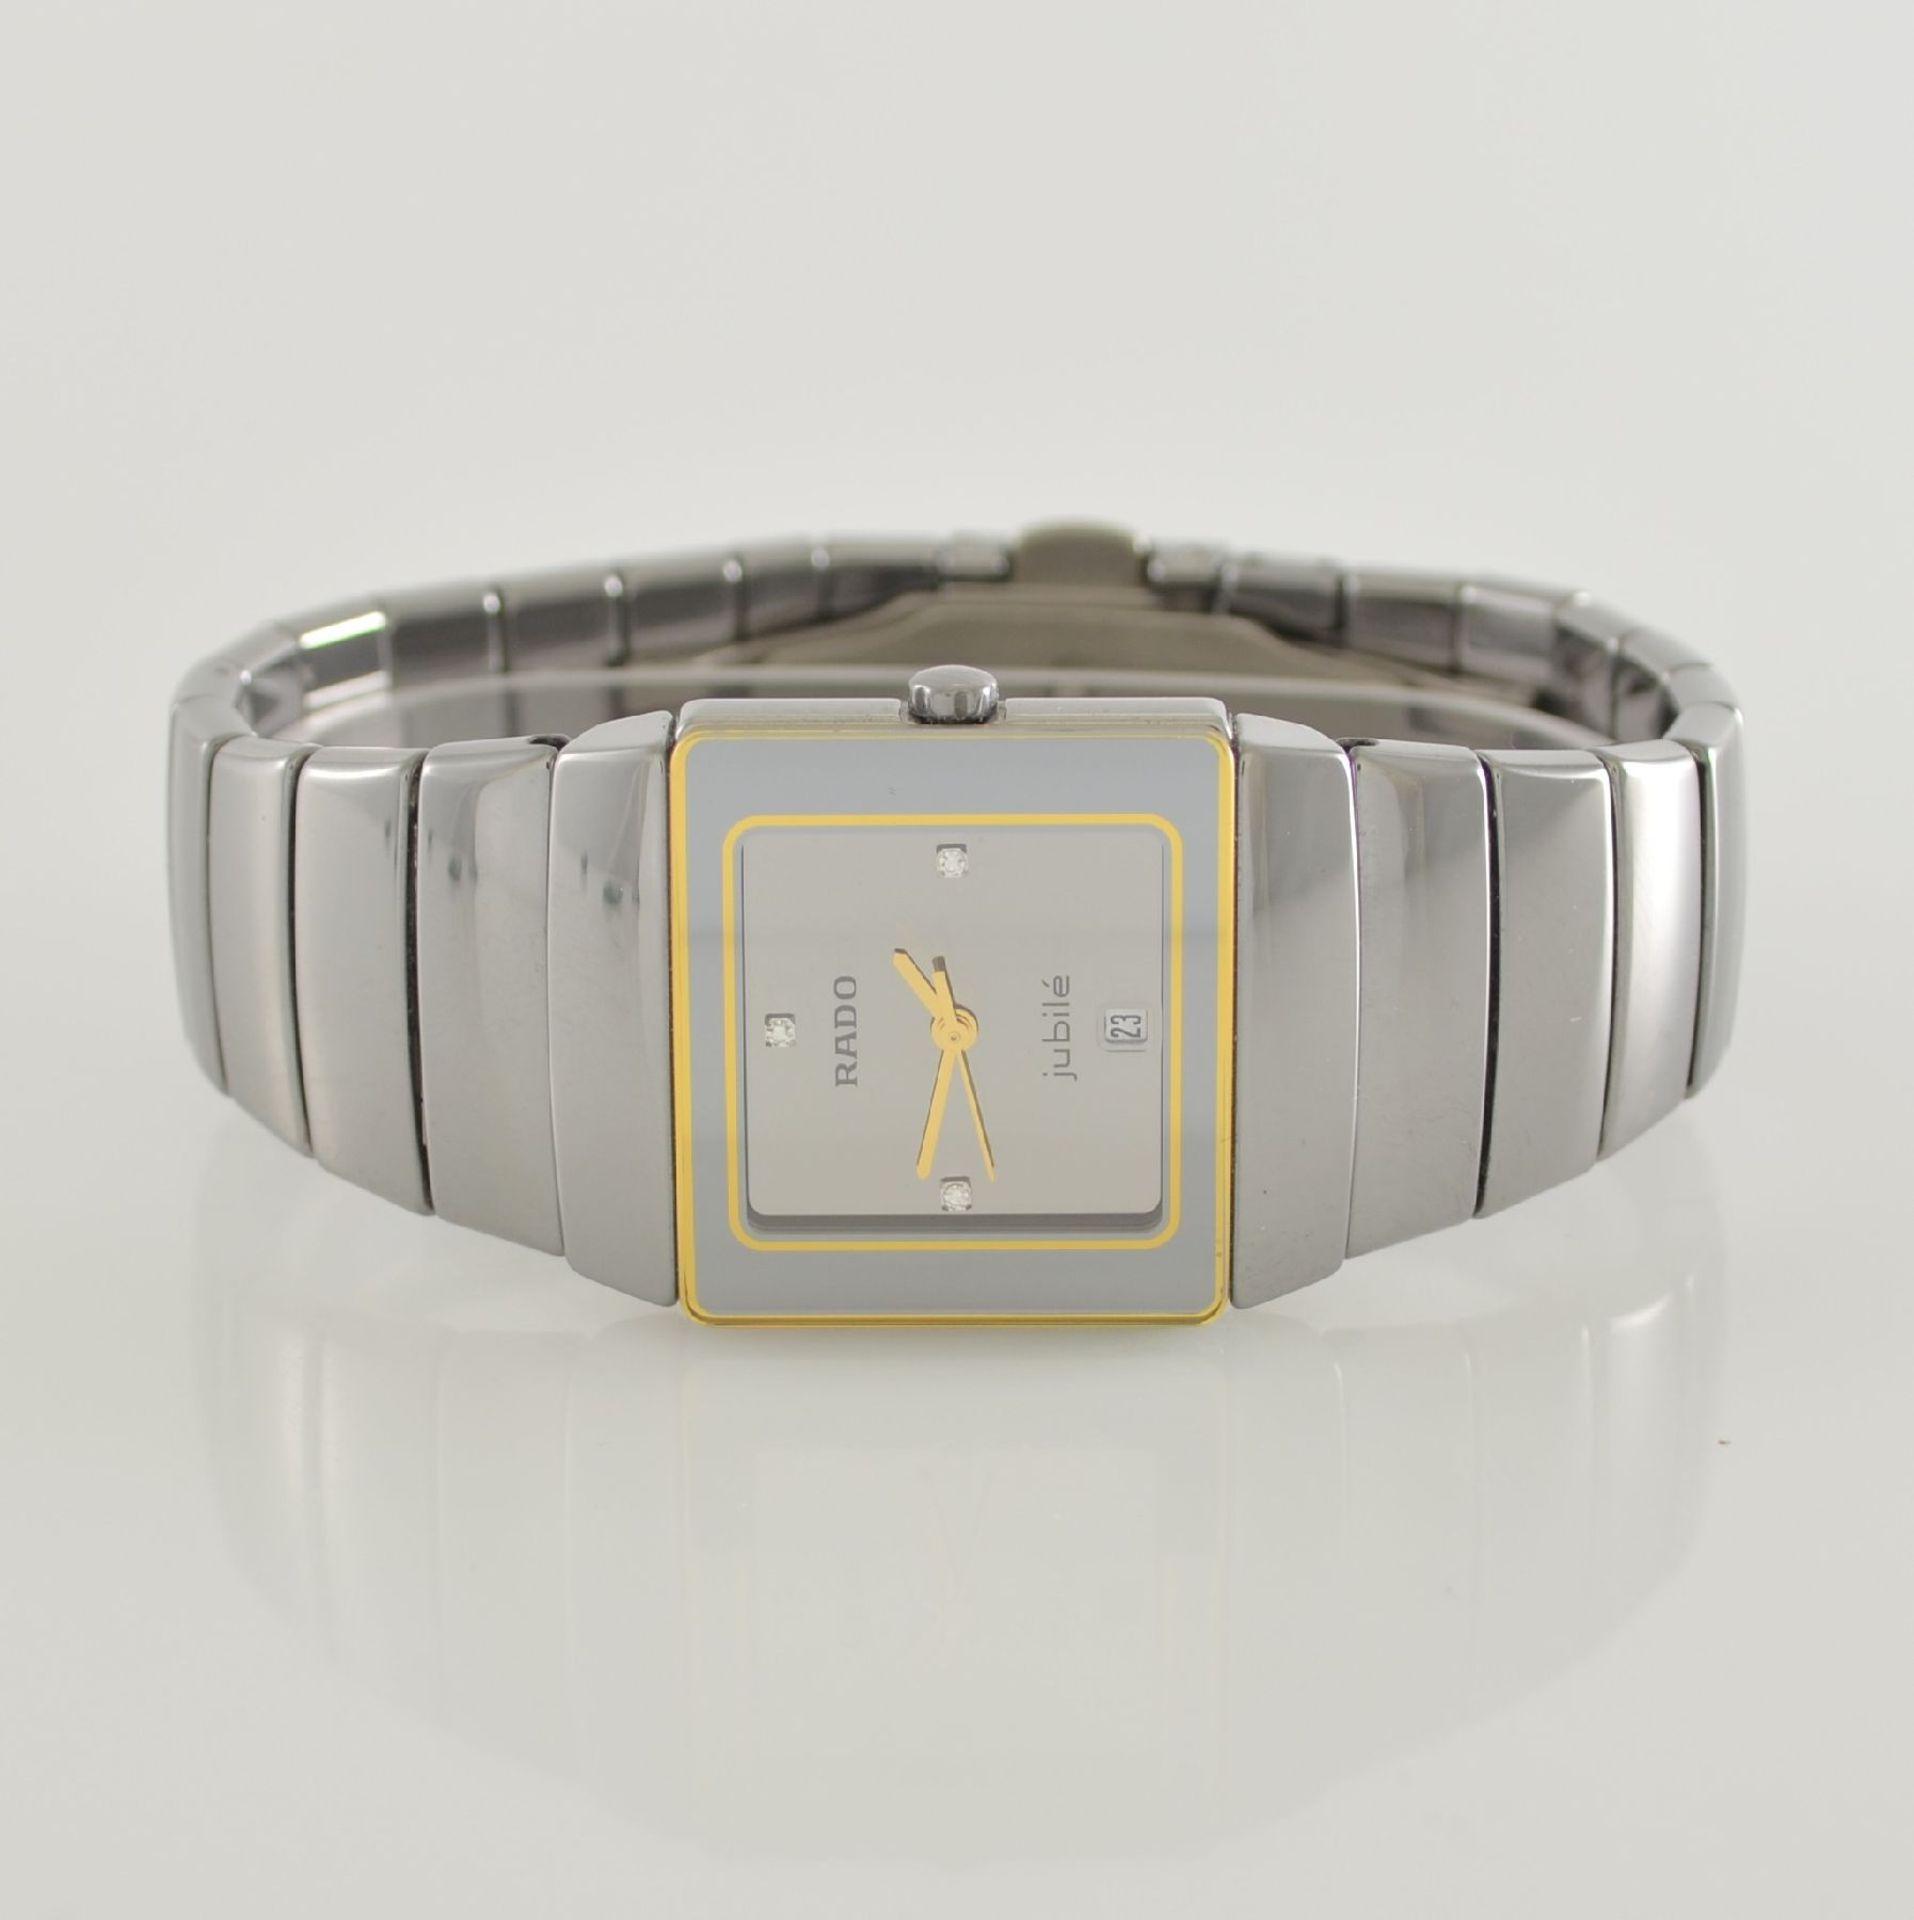 RADO Diastar Damenarmbanduhr, Schweiz um 1990, quarz, Ref. 111.0333.3, kratzfestes Keramikgehäuse